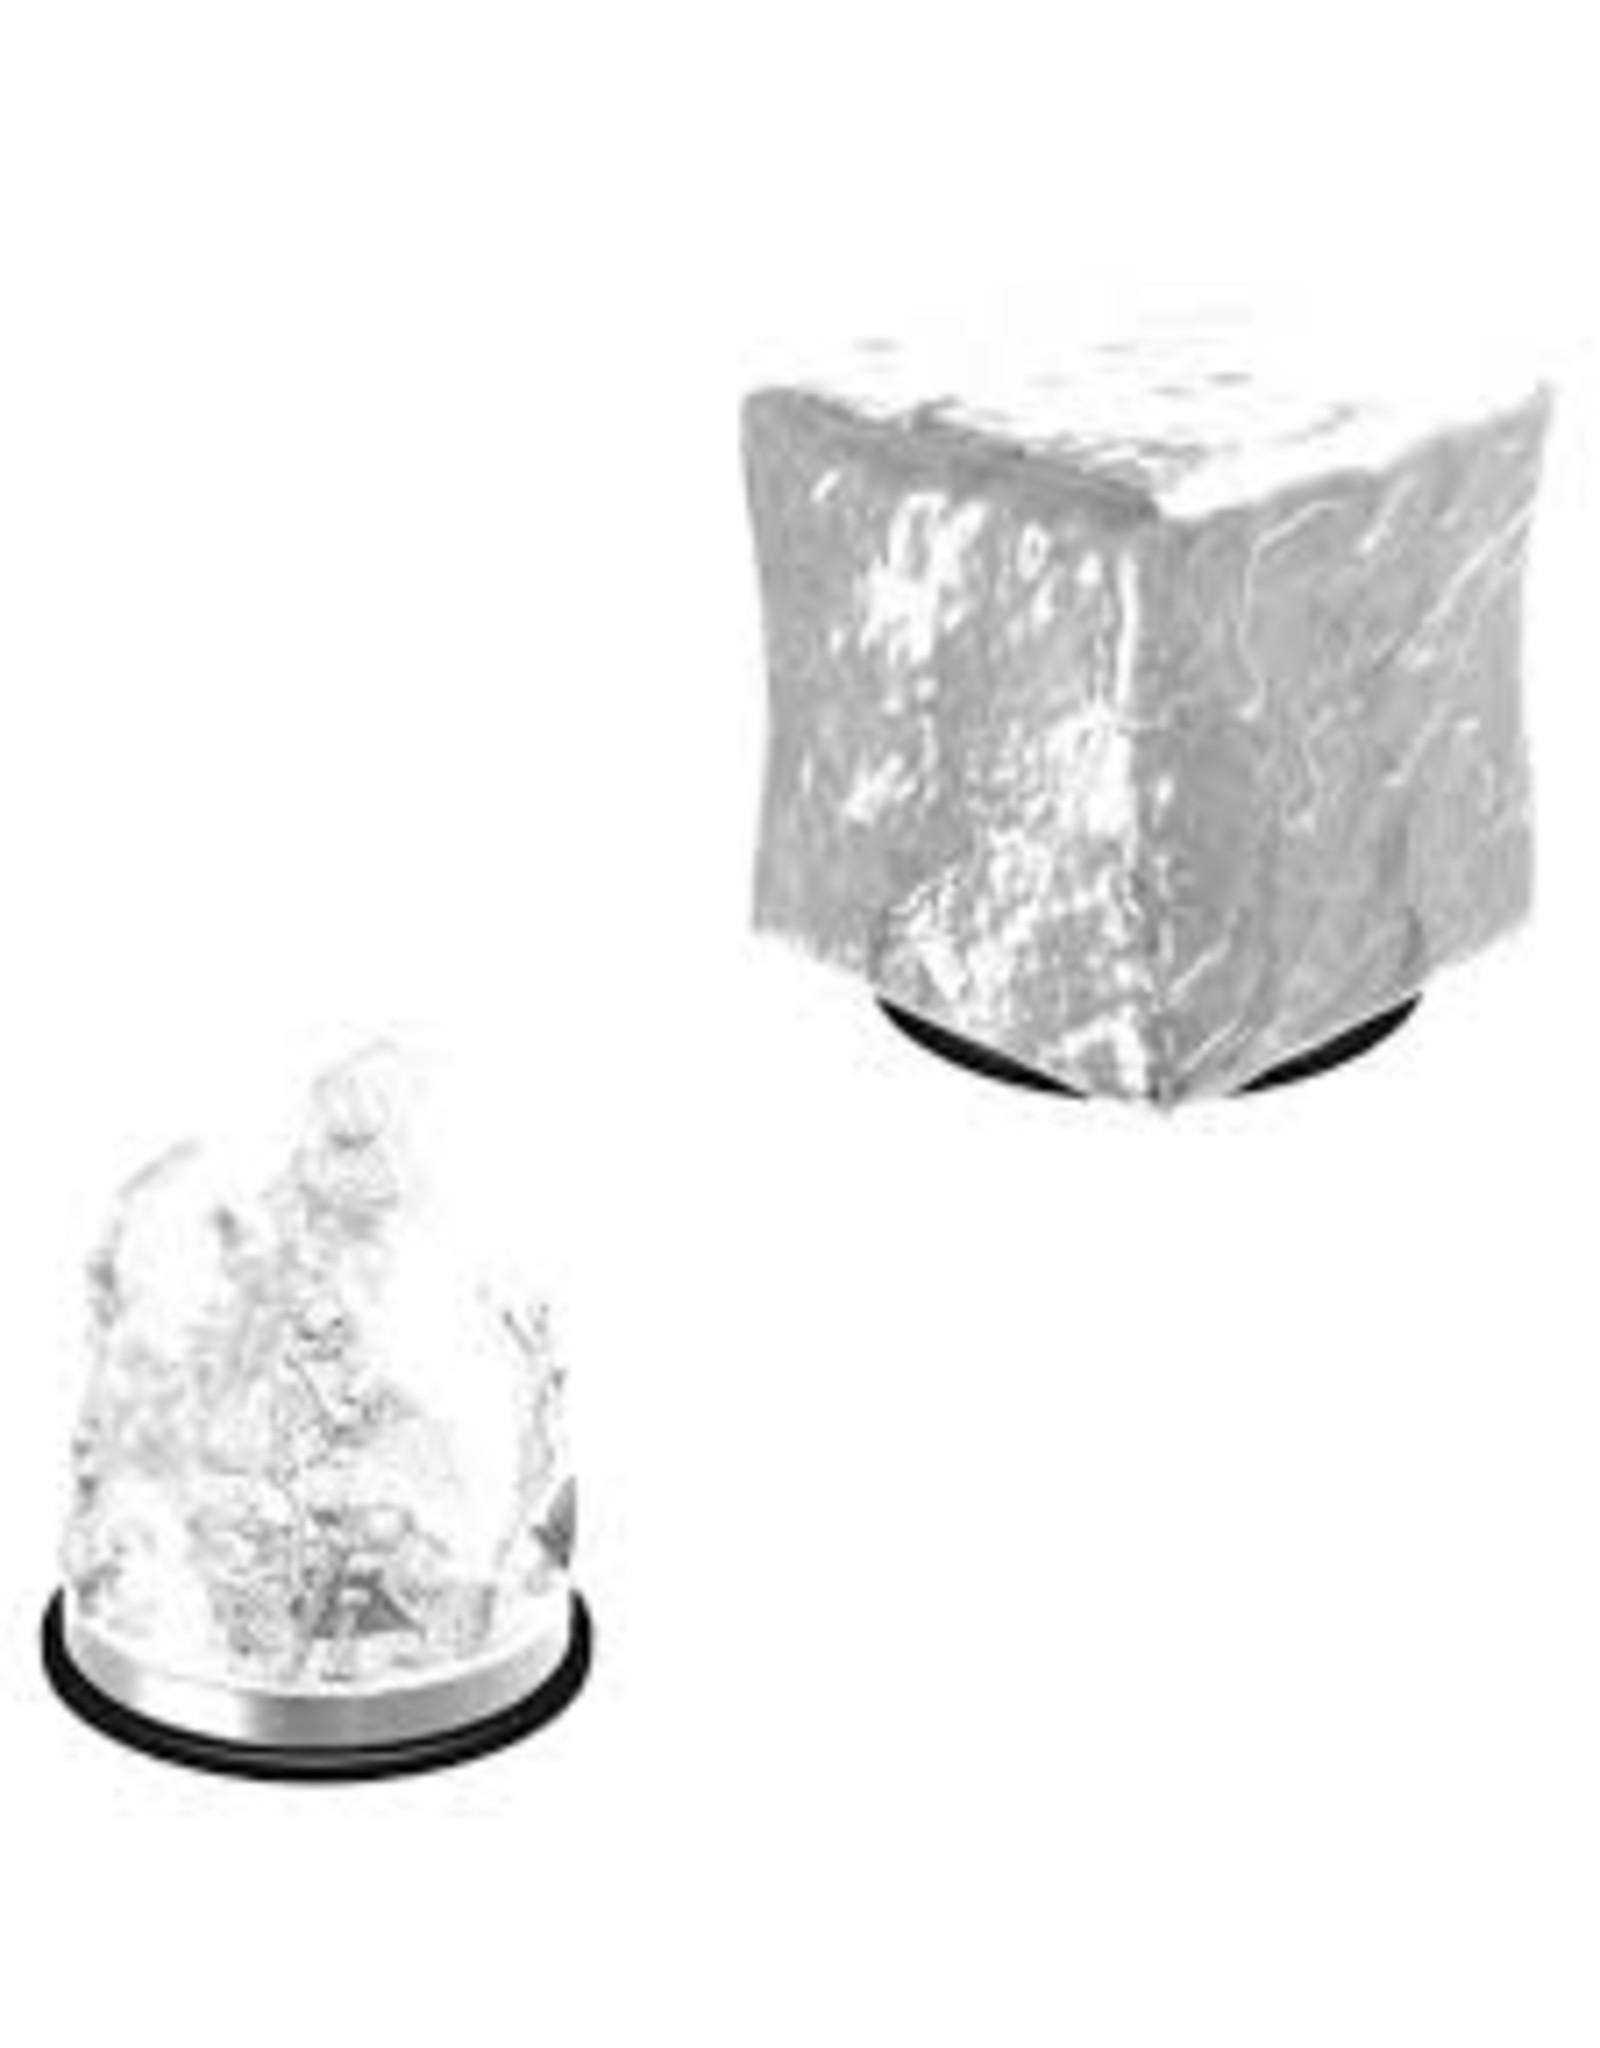 Wiz Kids D&D Nolzurs MUM: W12.5 Gelatinous Cube